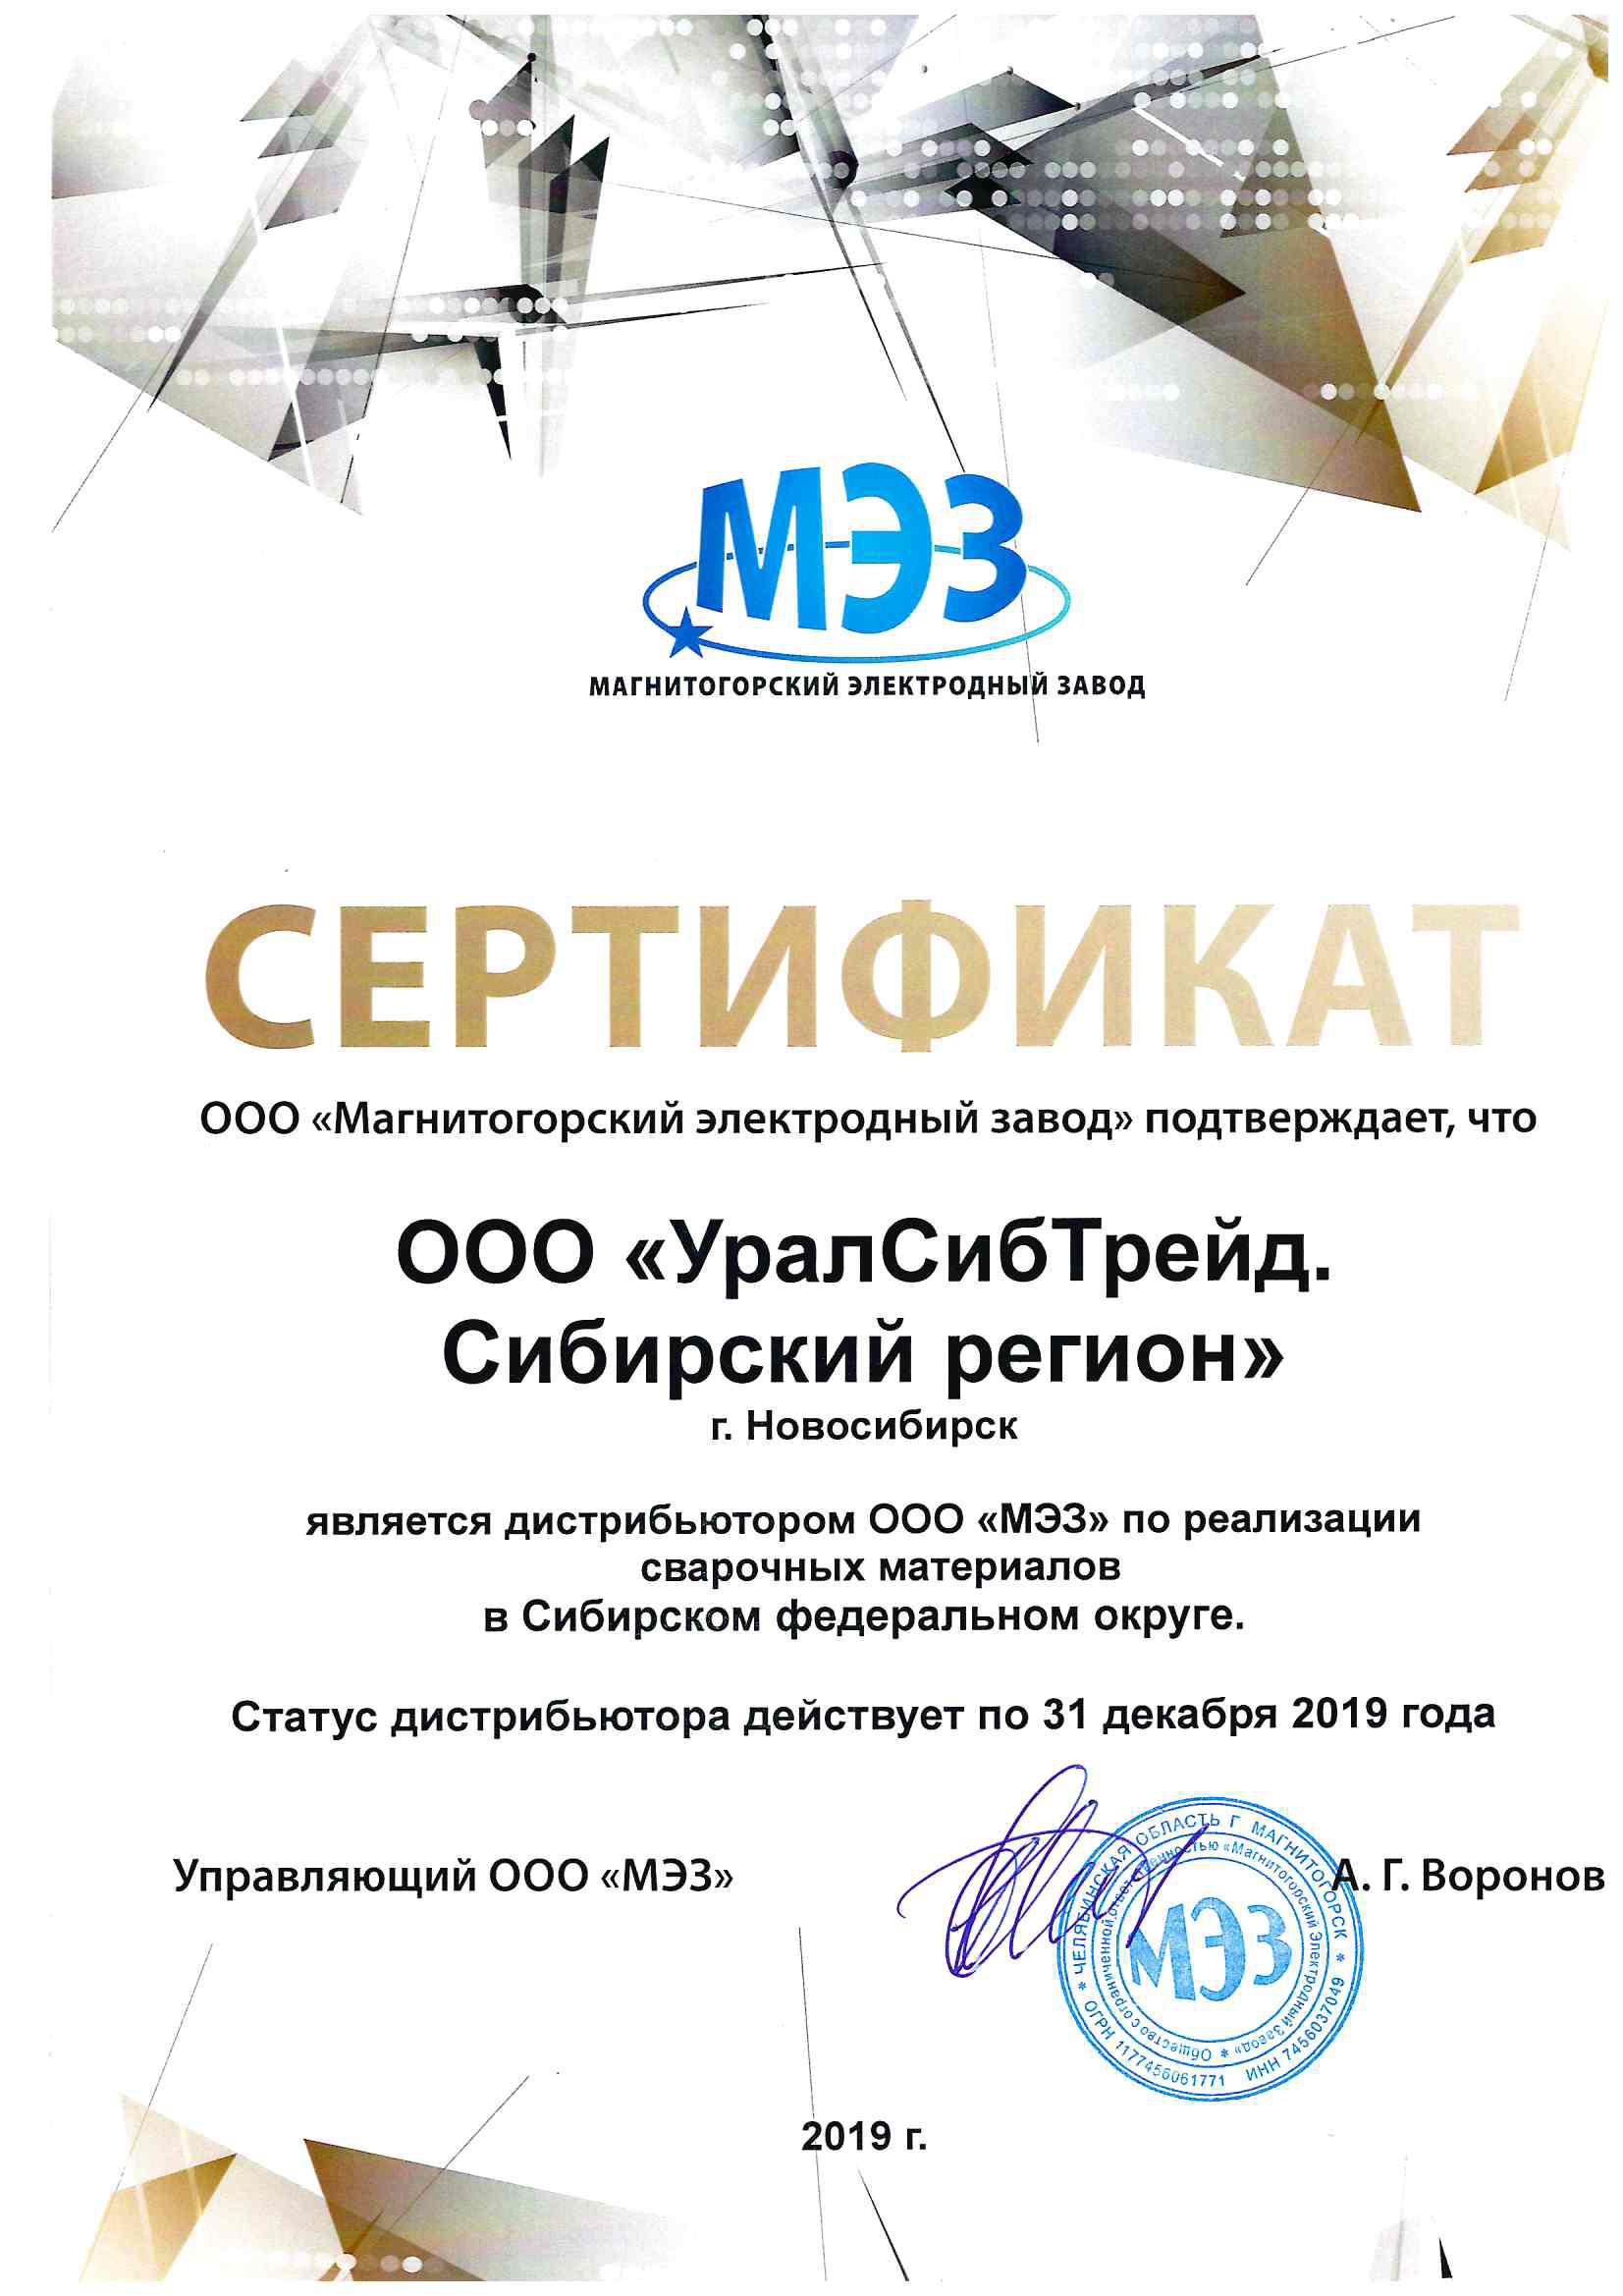 https://www.sibtrans.net/files/sibtrans-net/Image/diller-mez.png